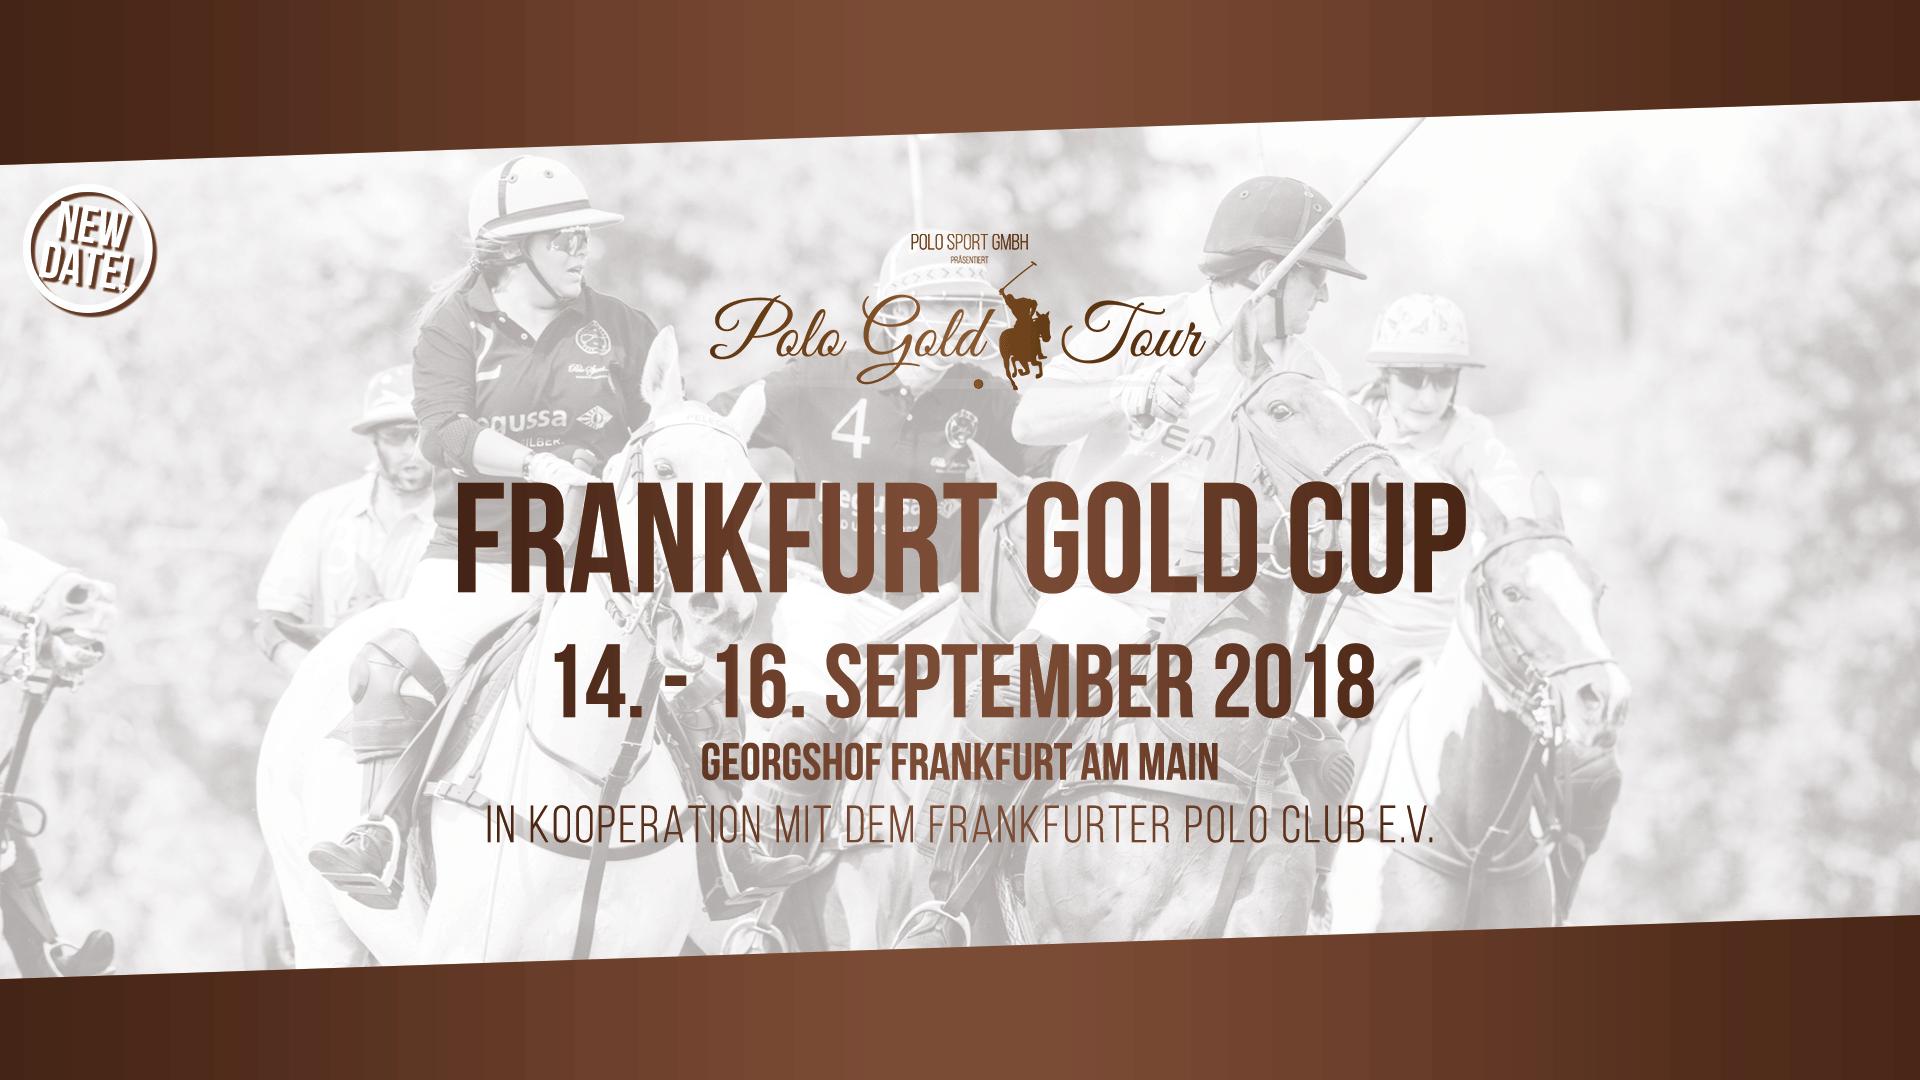 FRANKFURT GOLD CUP 2018